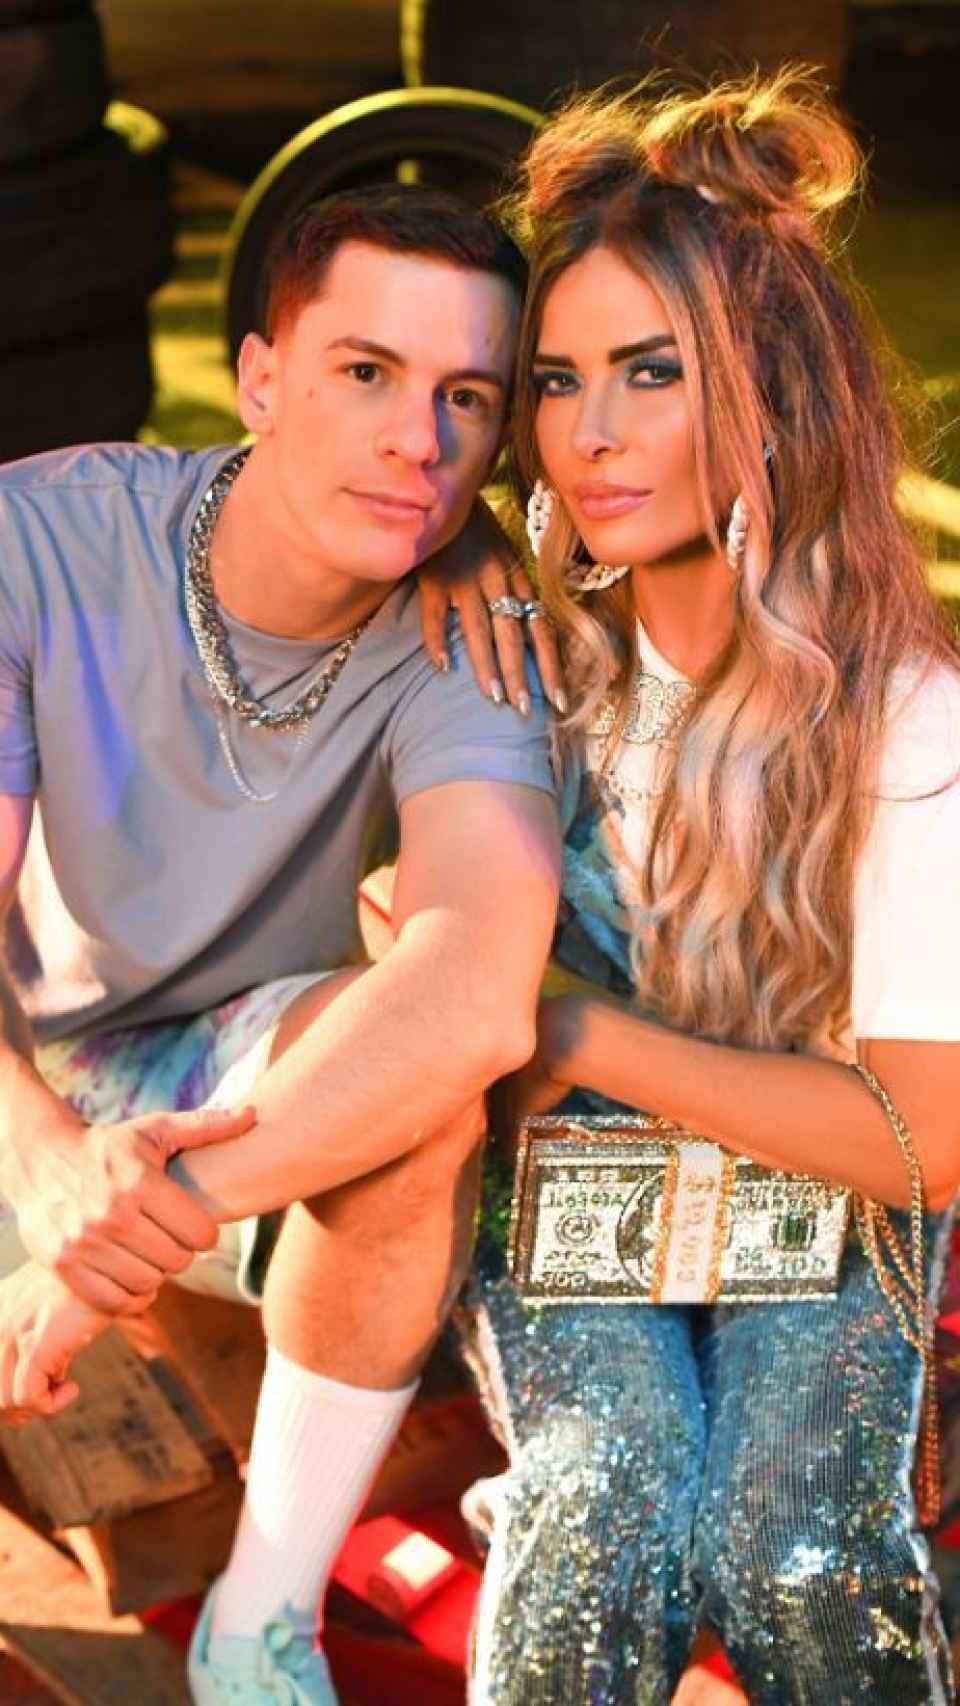 La cantante junto a su compañero Guaynaa.